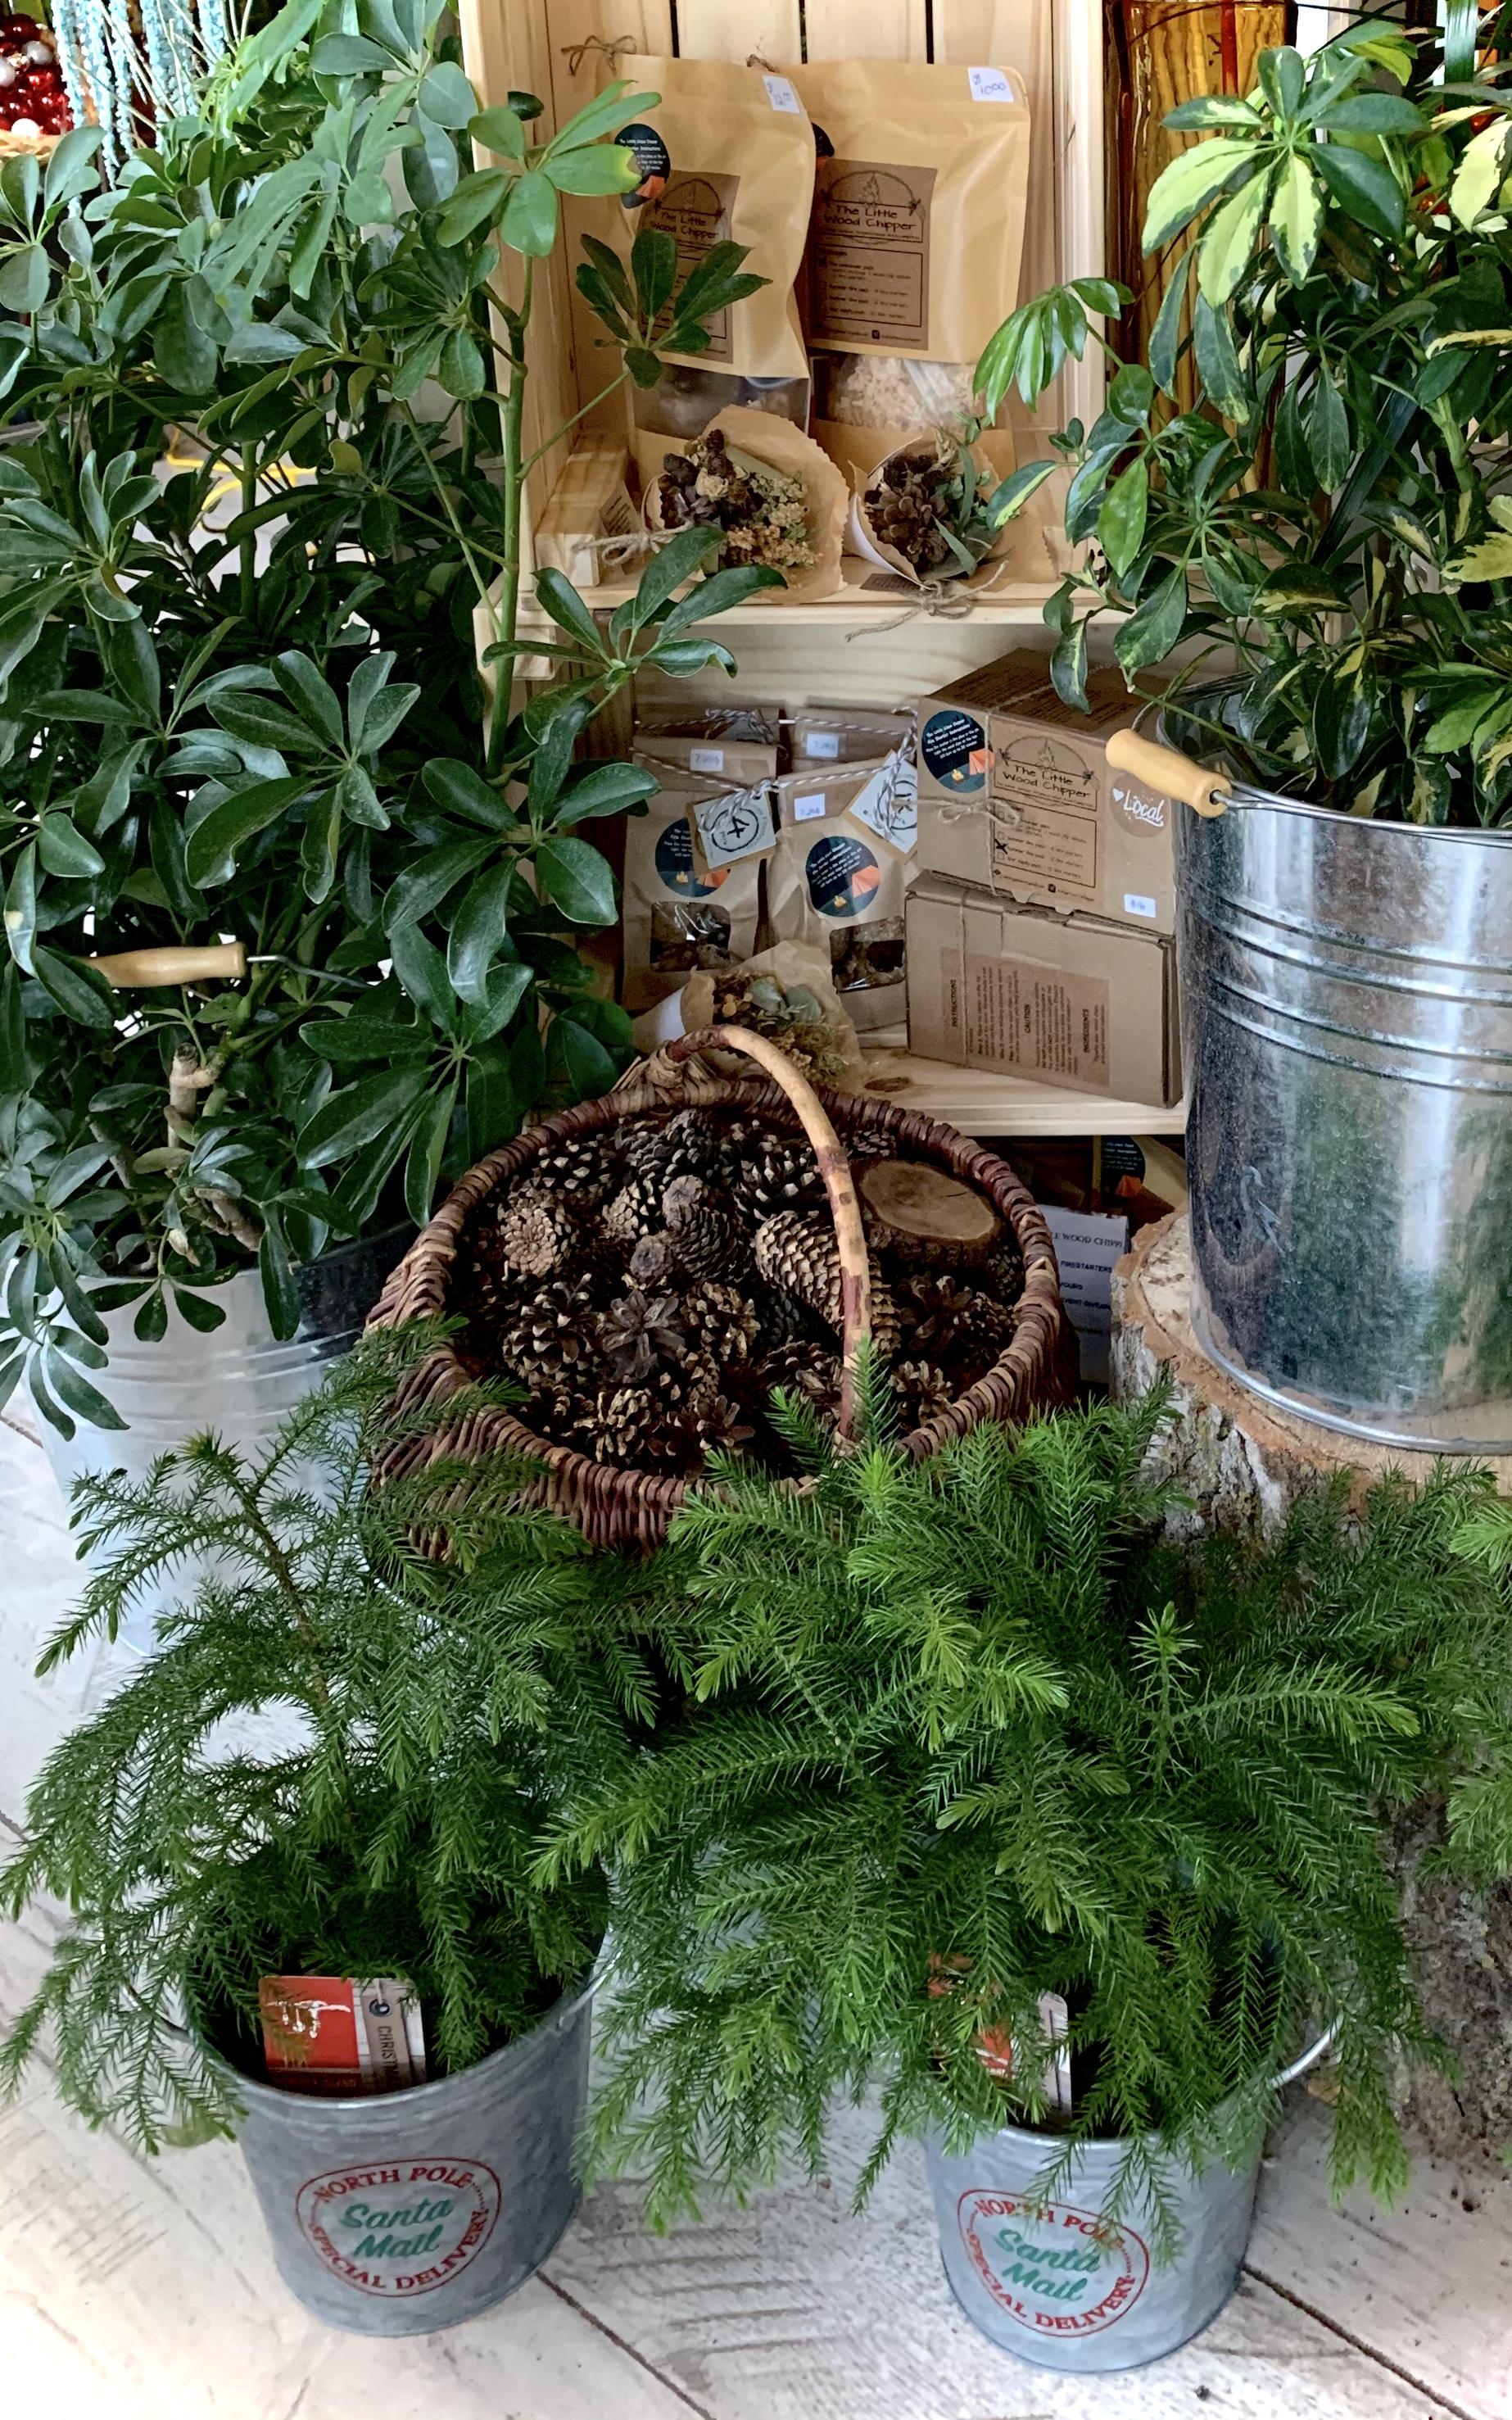 Assorted plants & Fire starters